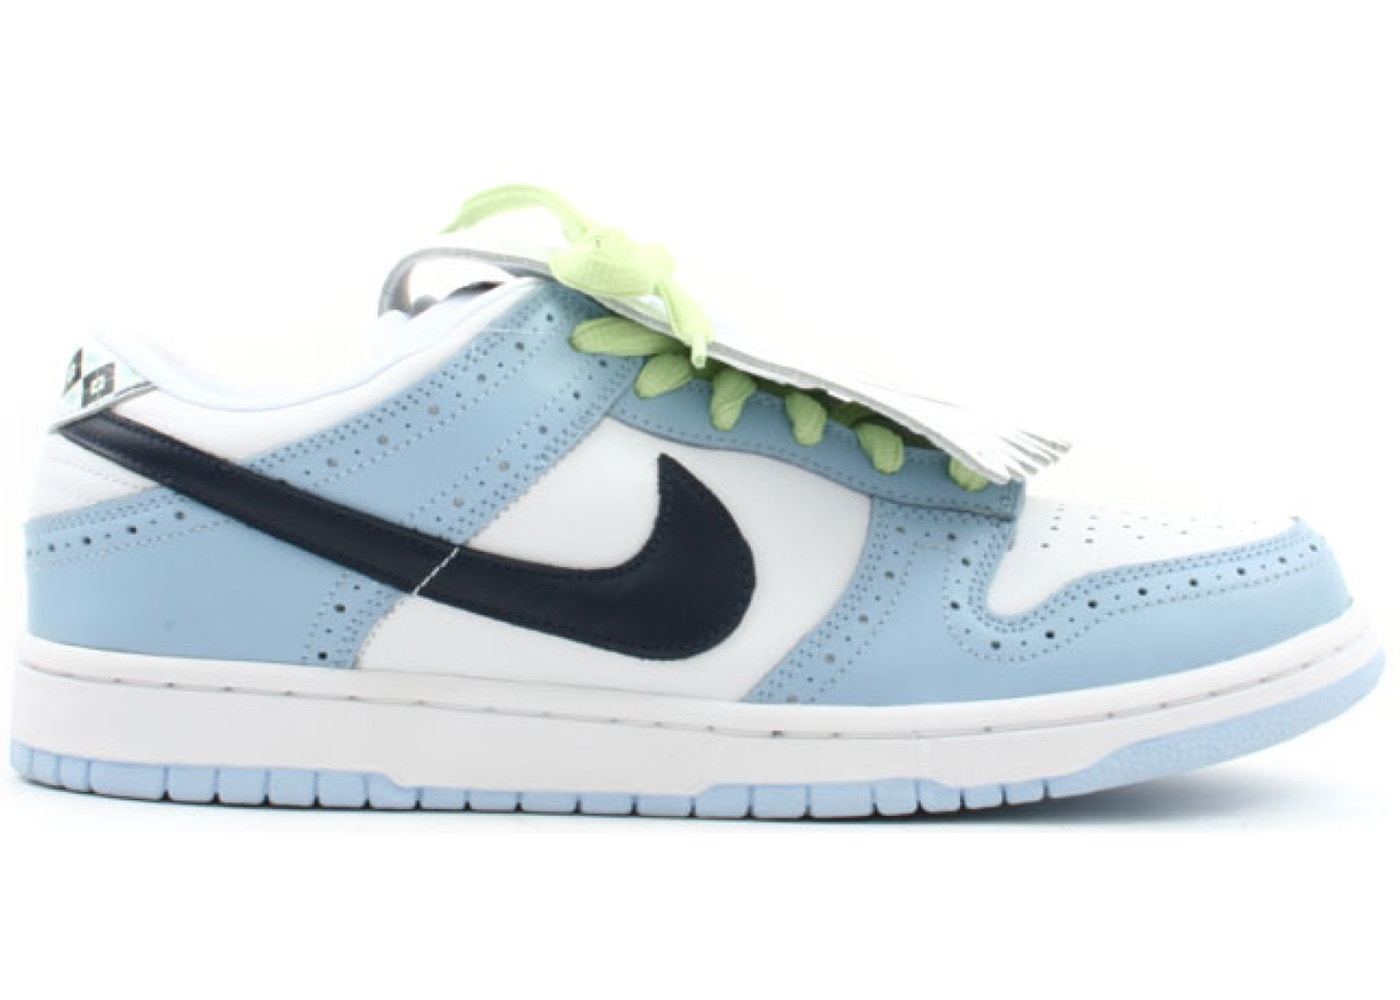 Nike SB Dunk Low Golf Pack Blue - 313170-141 229ca513d524